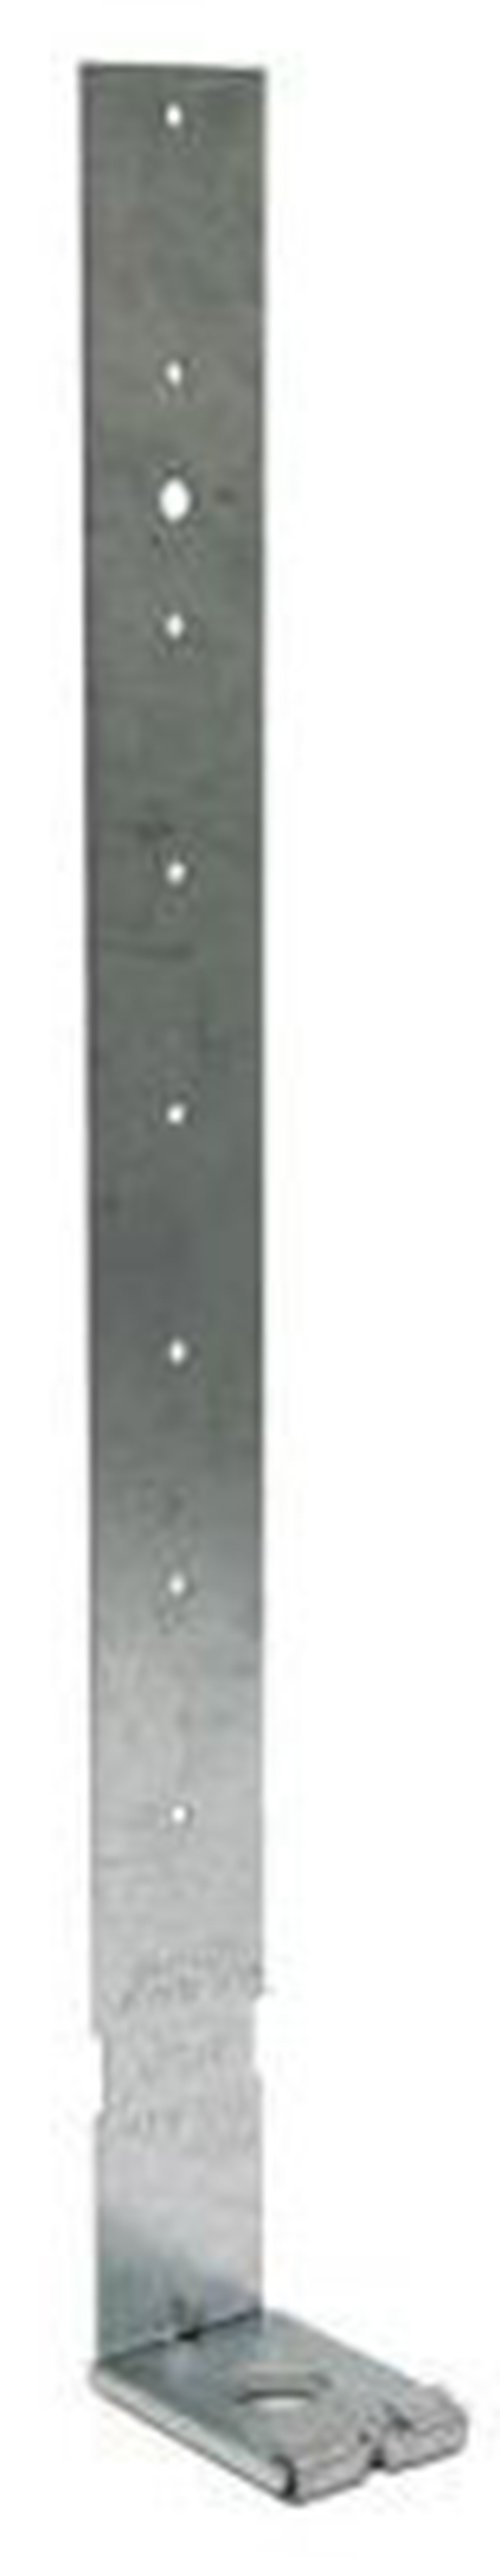 Simpson Strong Tie LTT19 16-Gauge Light Tension Tie 10-per box